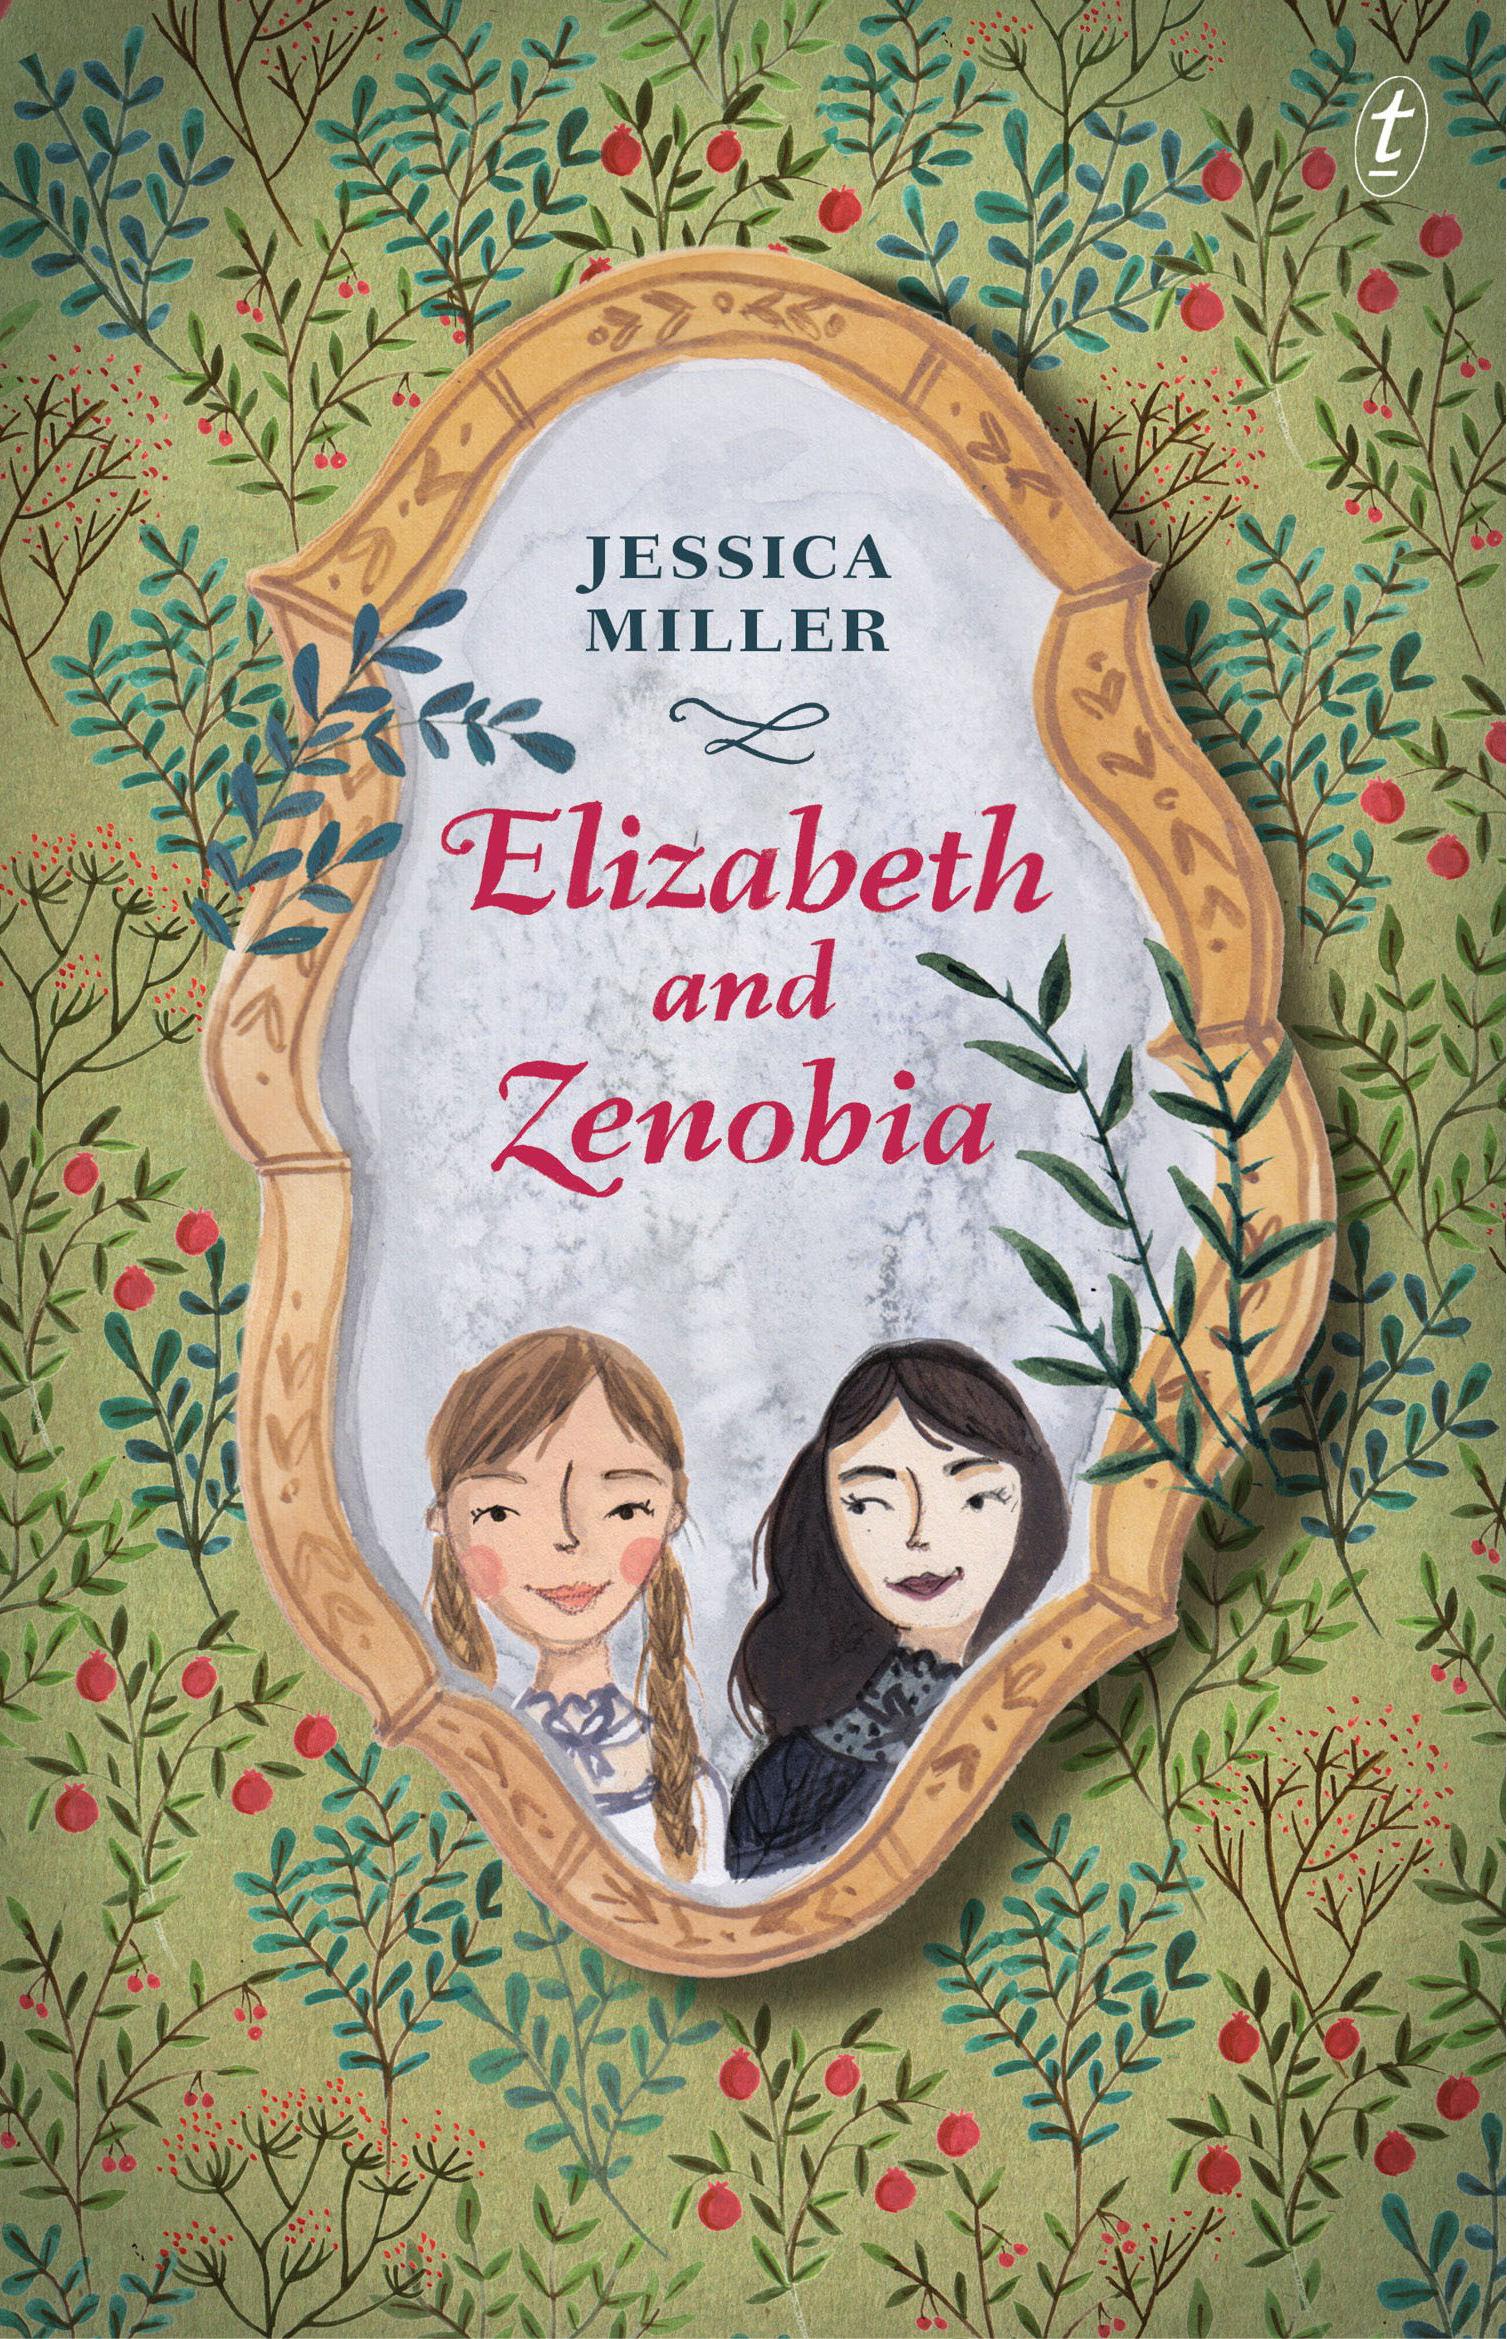 emma block book cover elizabeth and zenobia